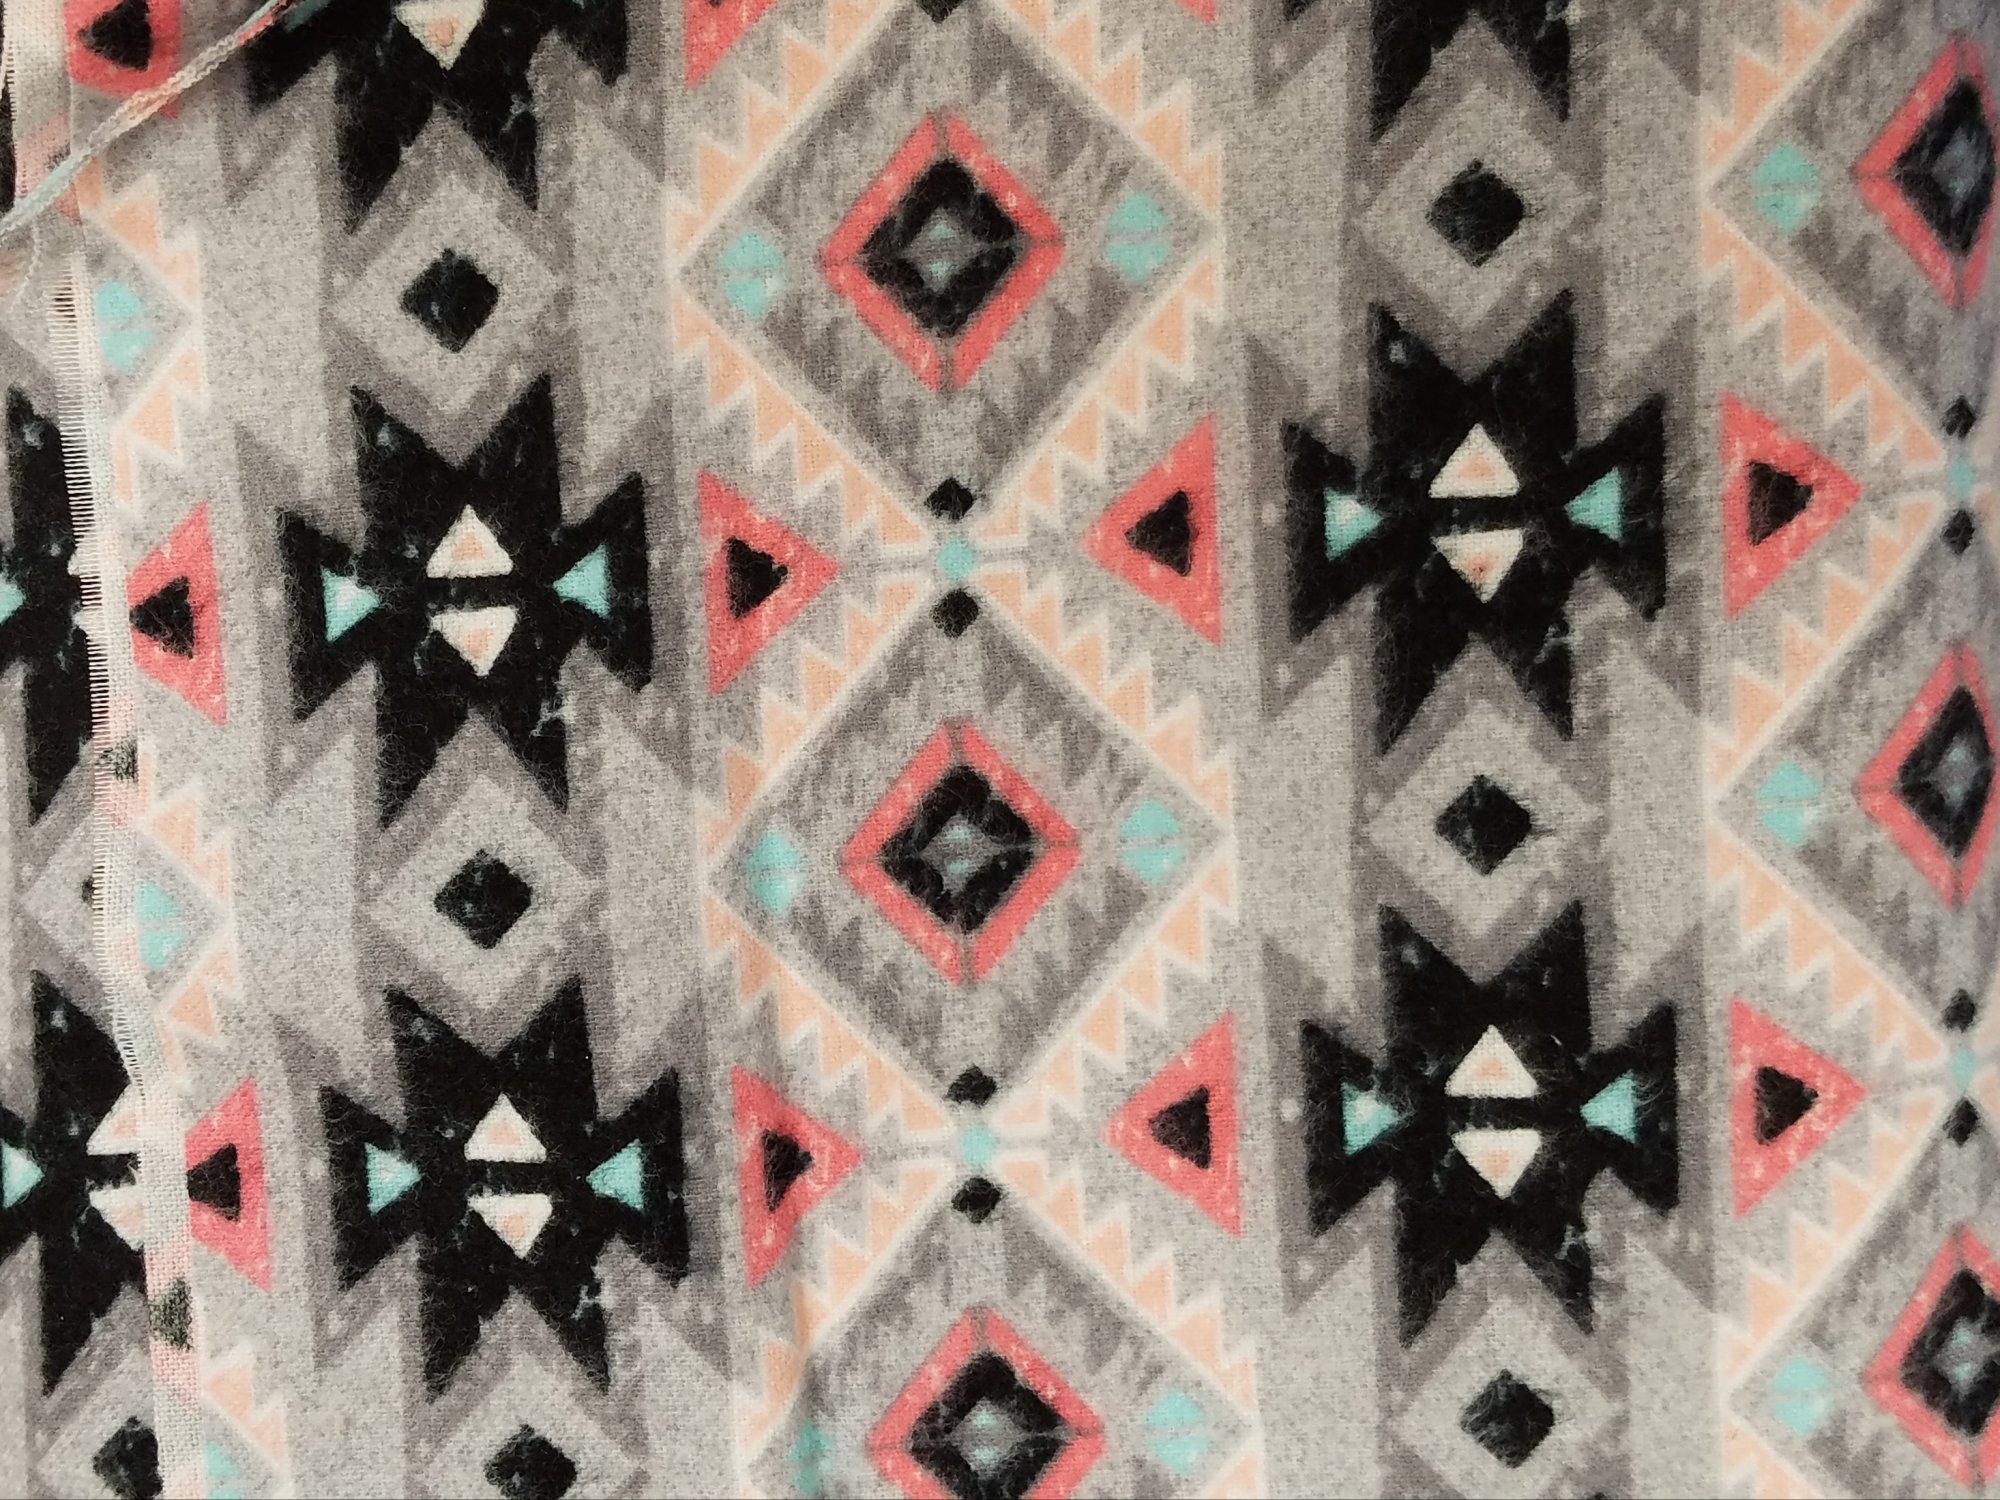 MAYW Pink Gray Turq Tribal